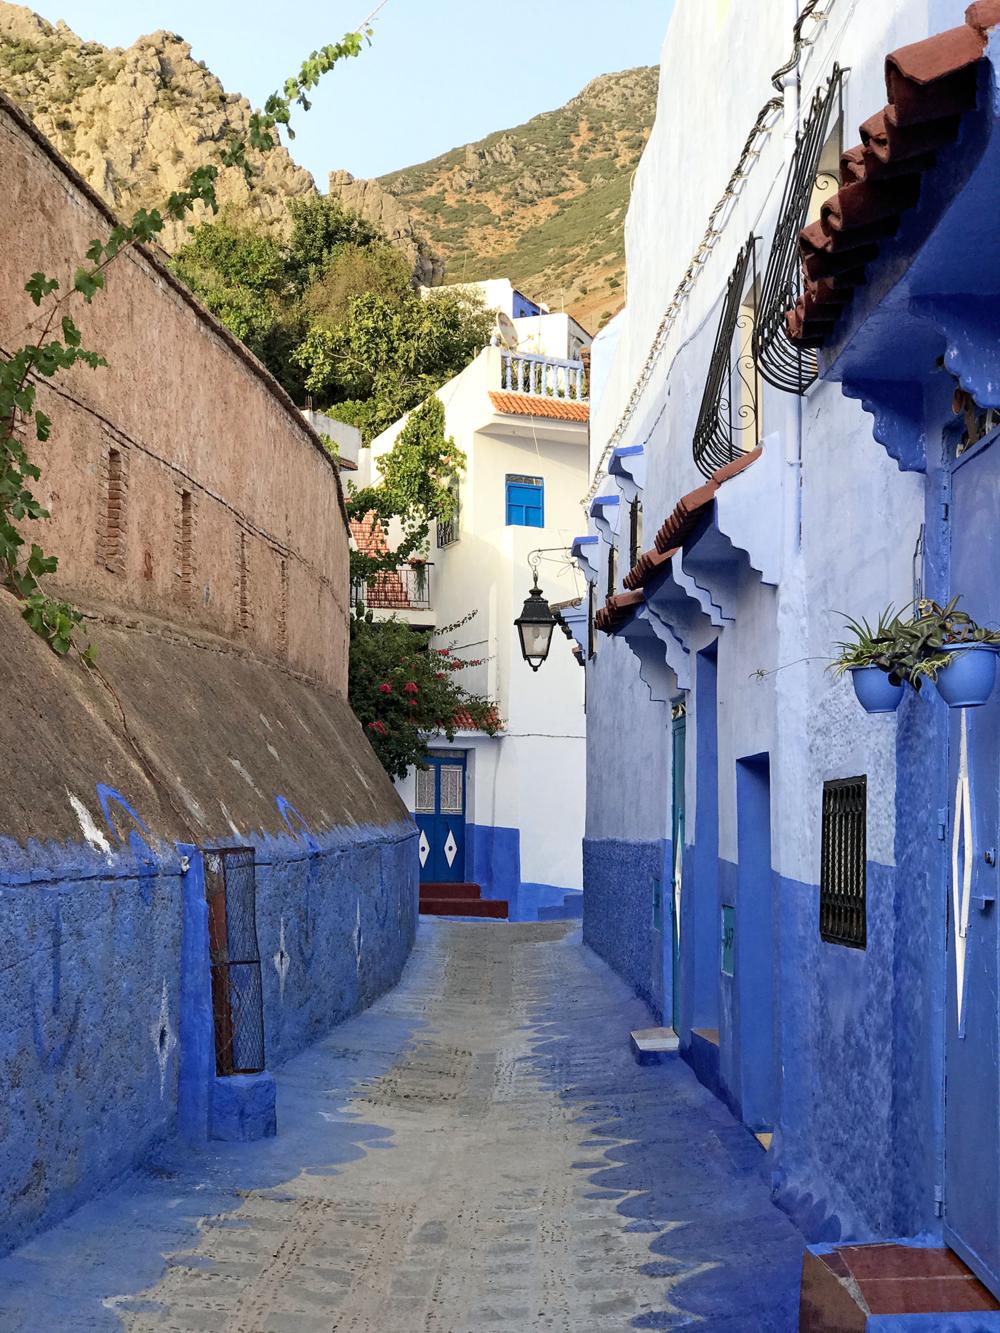 Blue City of Chefchaouen Morocco | Photos of Morocco